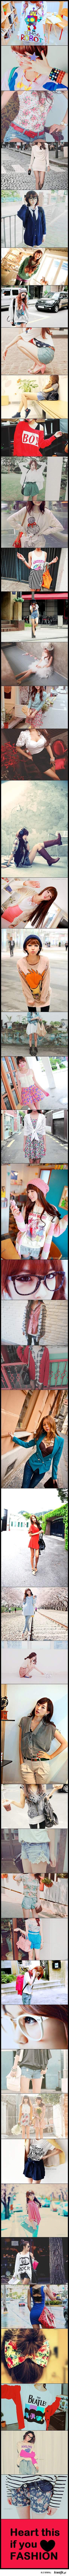 korean fashion:)